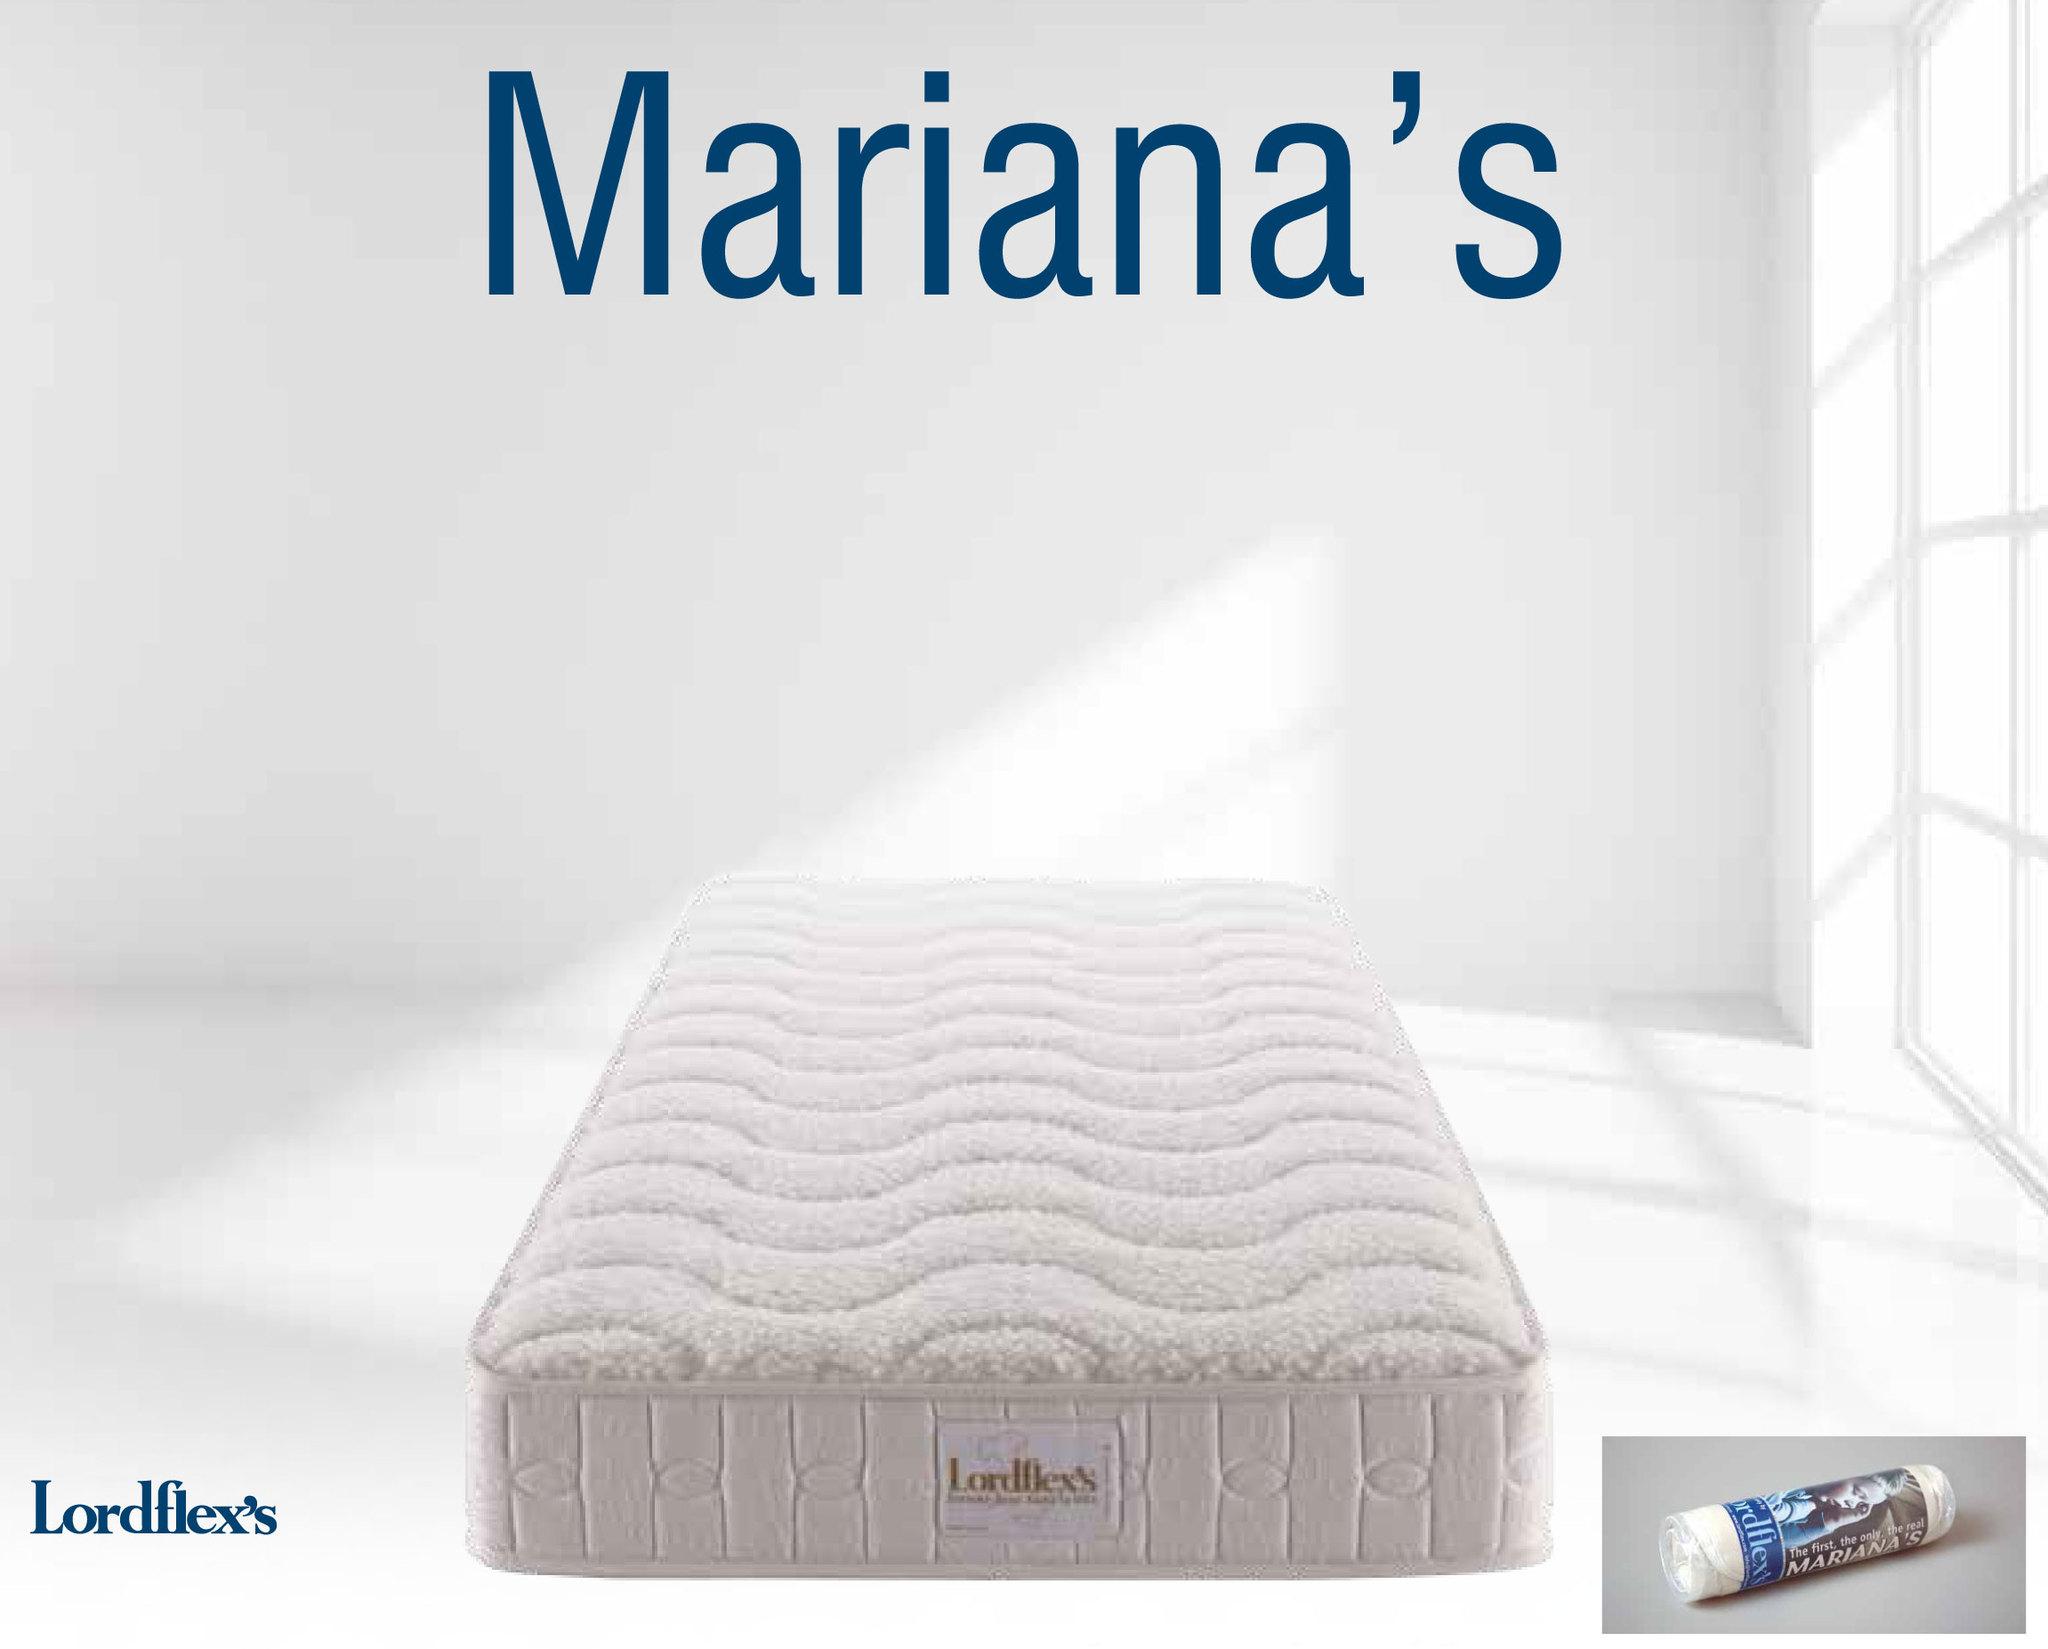 Матрасы Матрас ортопедический Lordflex's Mariana's 170х190 до 140 кг 1_Mariana_s.jpg